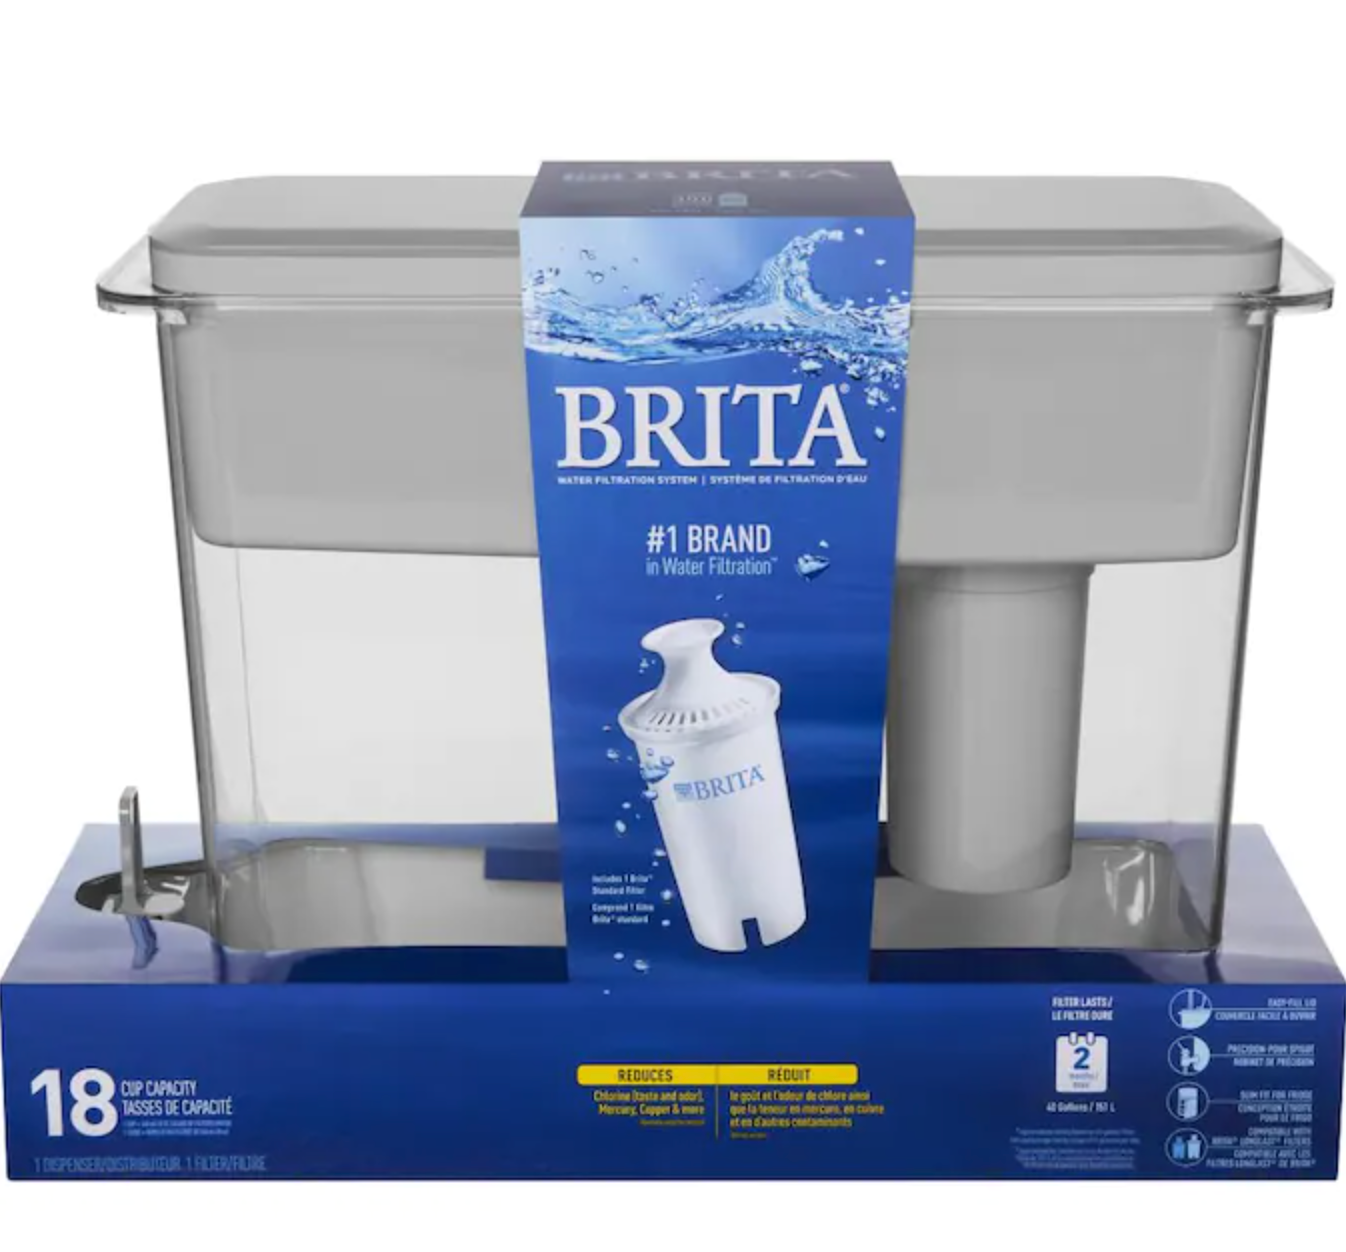 Brita 18-cup water filter